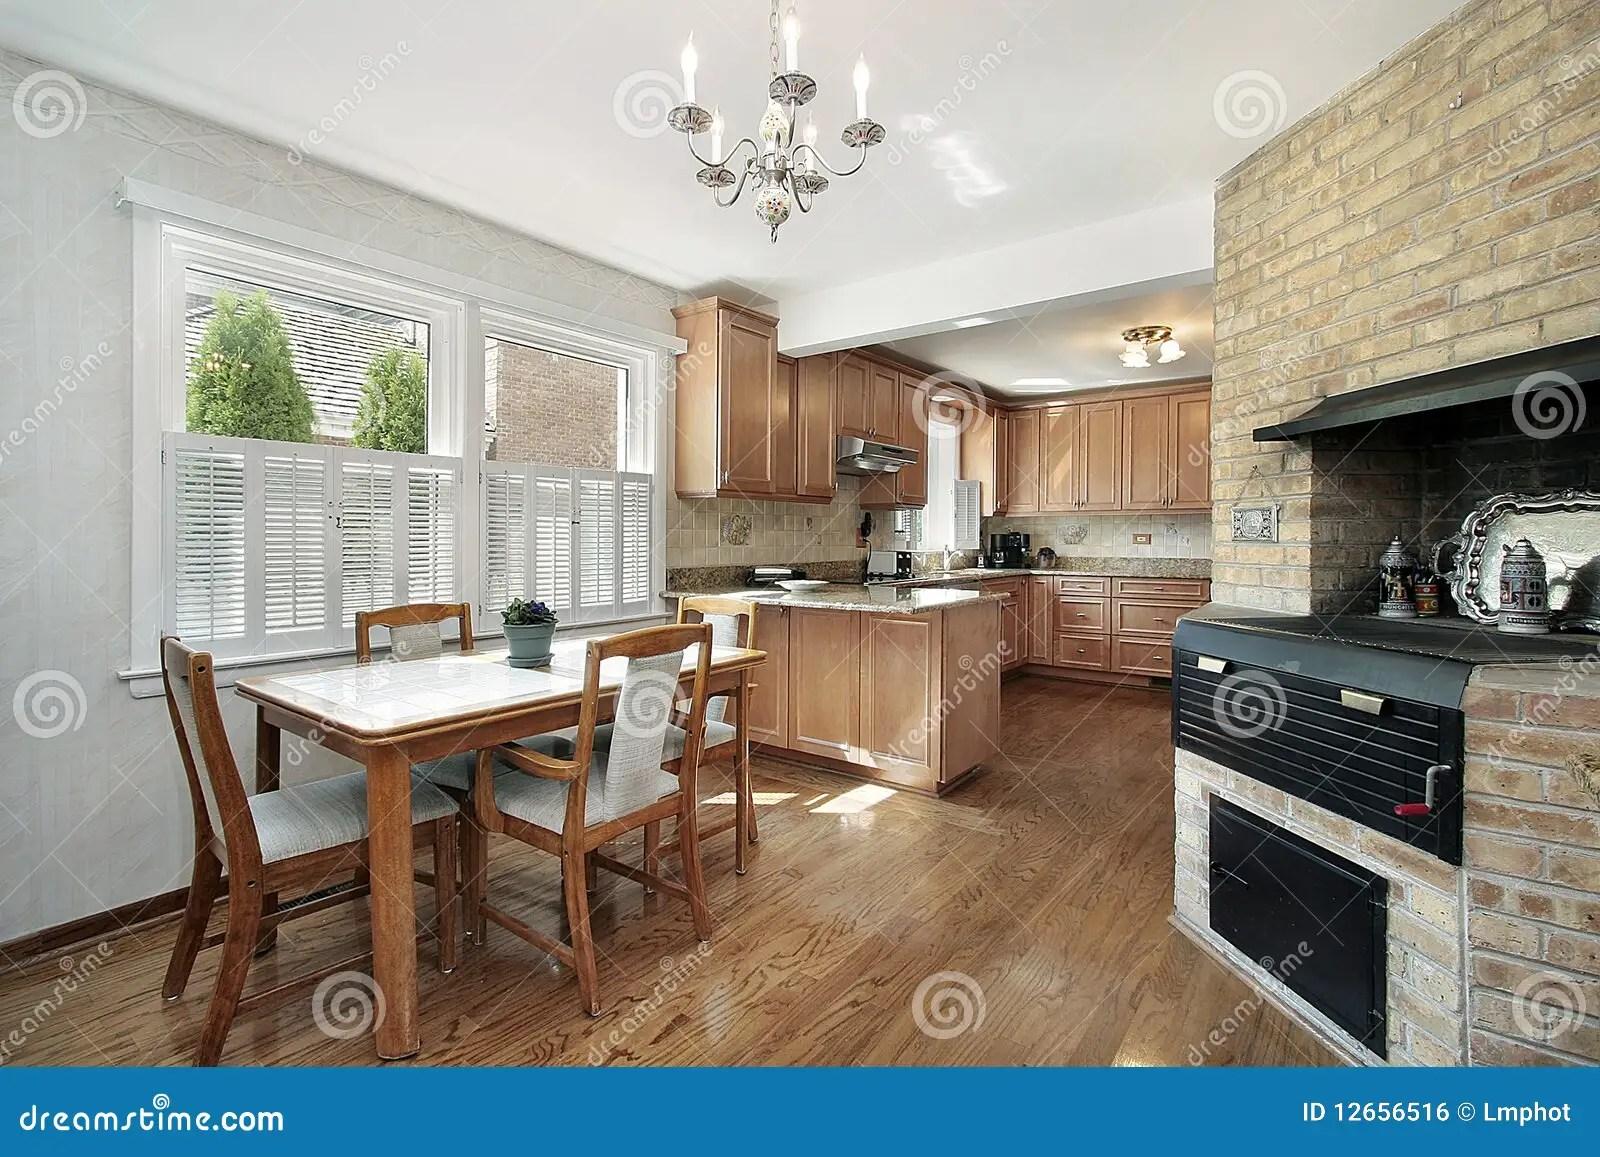 kitchen walls amazon cabinets 砖厨房墙壁库存照片 图片包括有系列 内部 不锈 计数器 海岛 设计 砖厨房墙壁